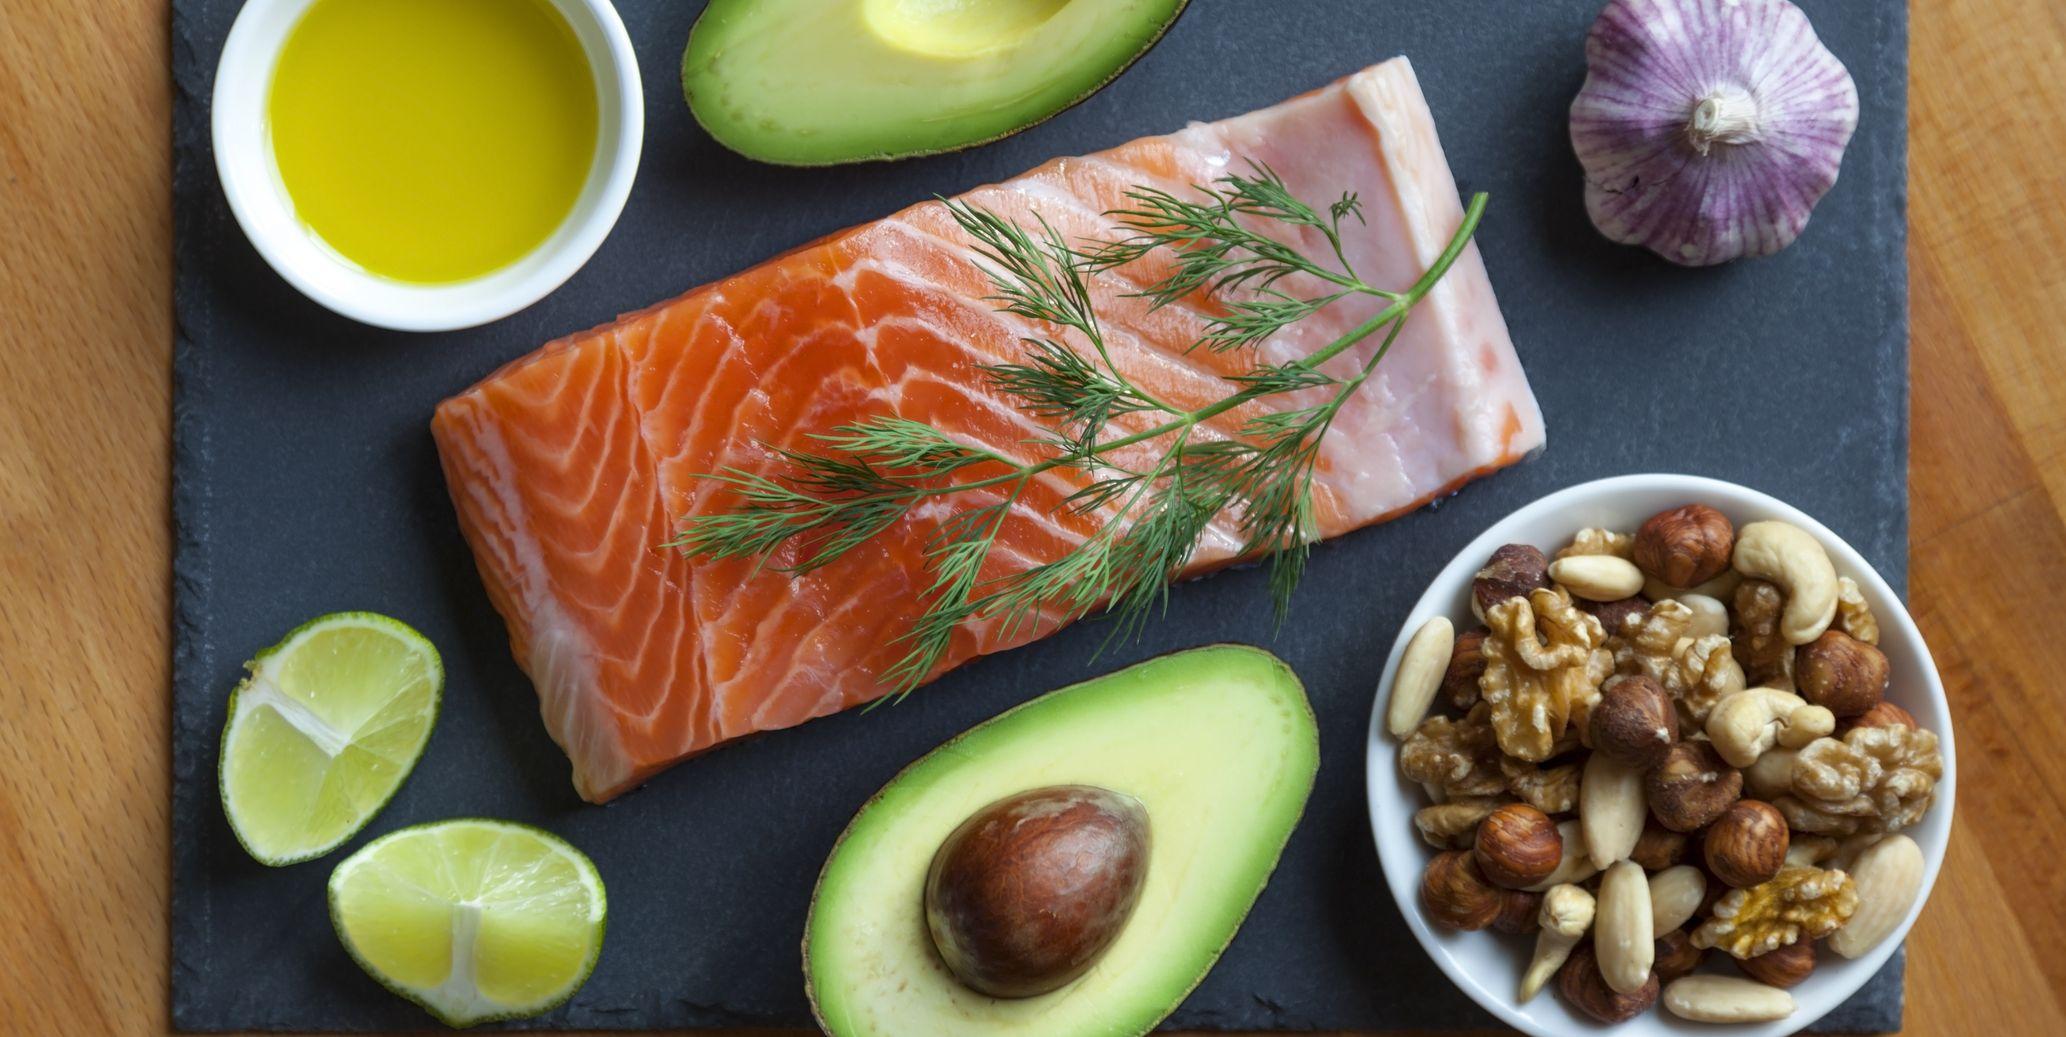 low-fat diet study